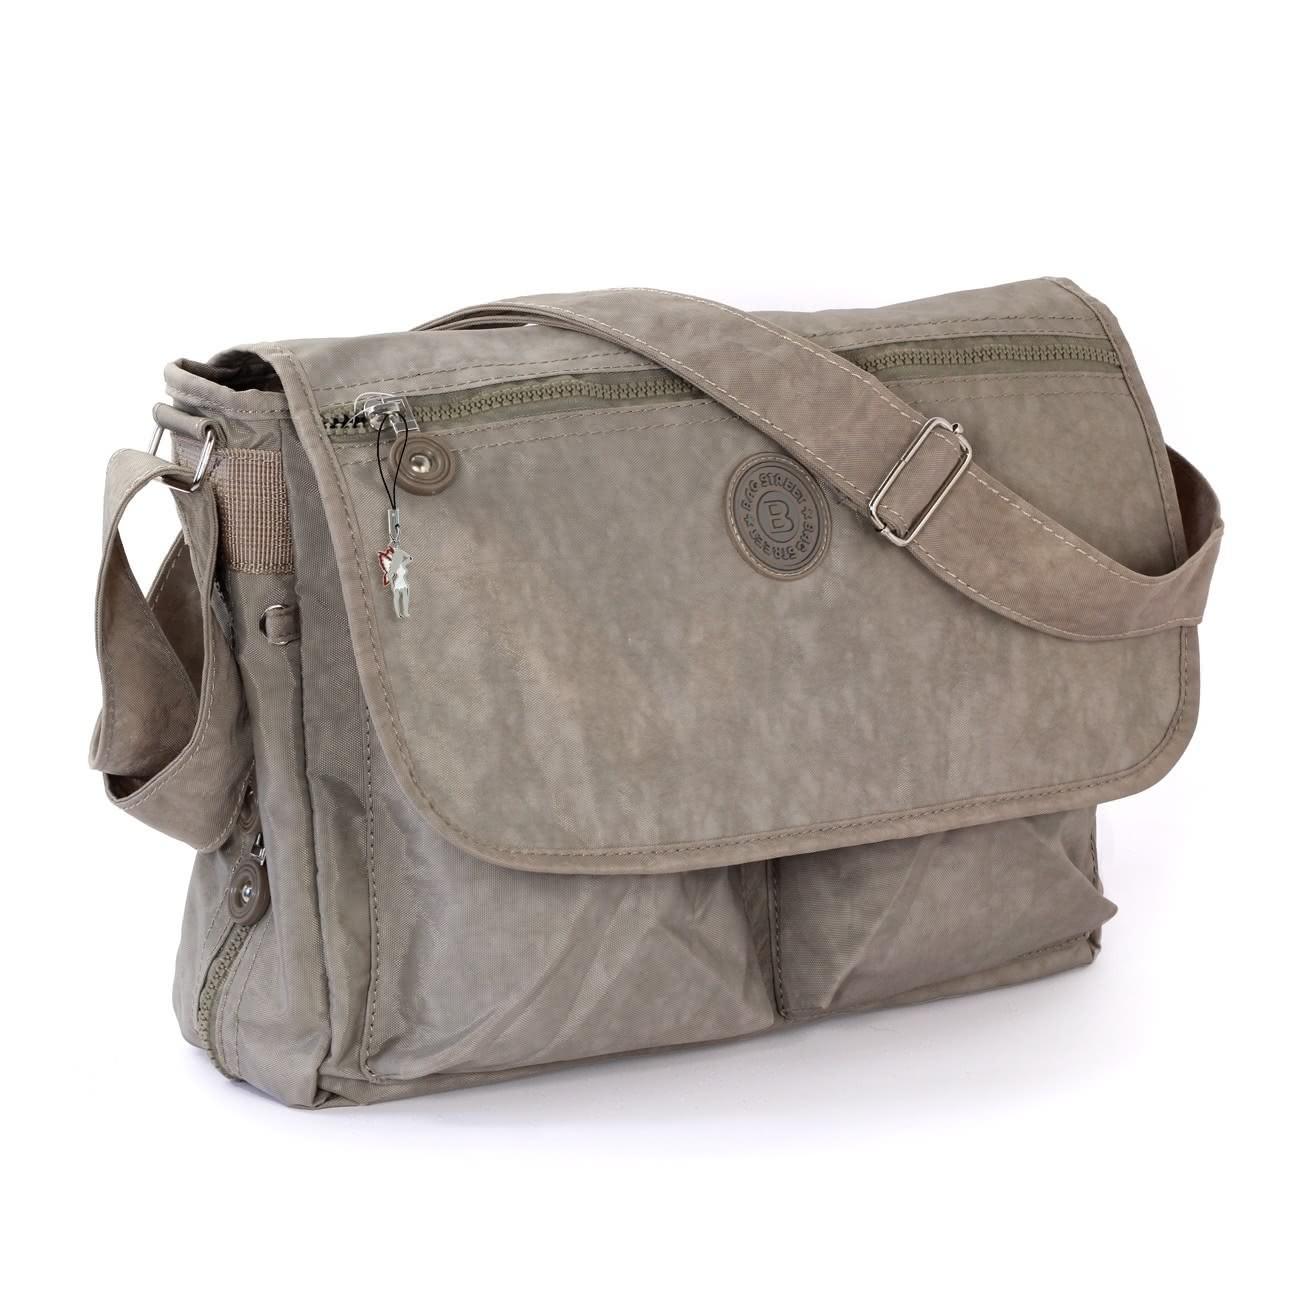 Schultertasche Nylon stone grau Cross-Body Umhängetasche Bag Street OTJ203L